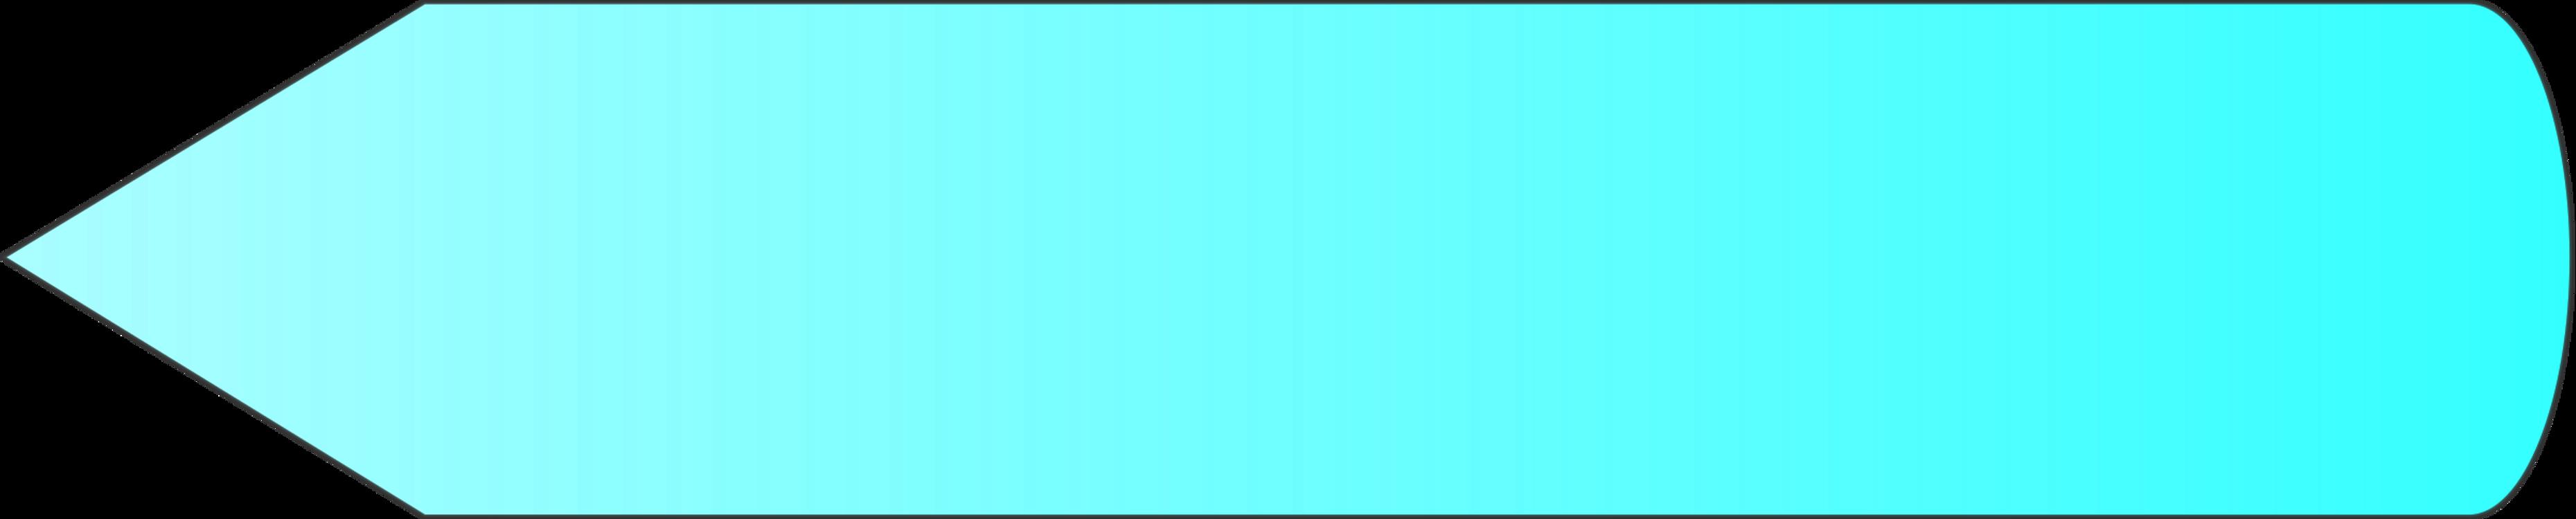 Blue,Grass,Angle